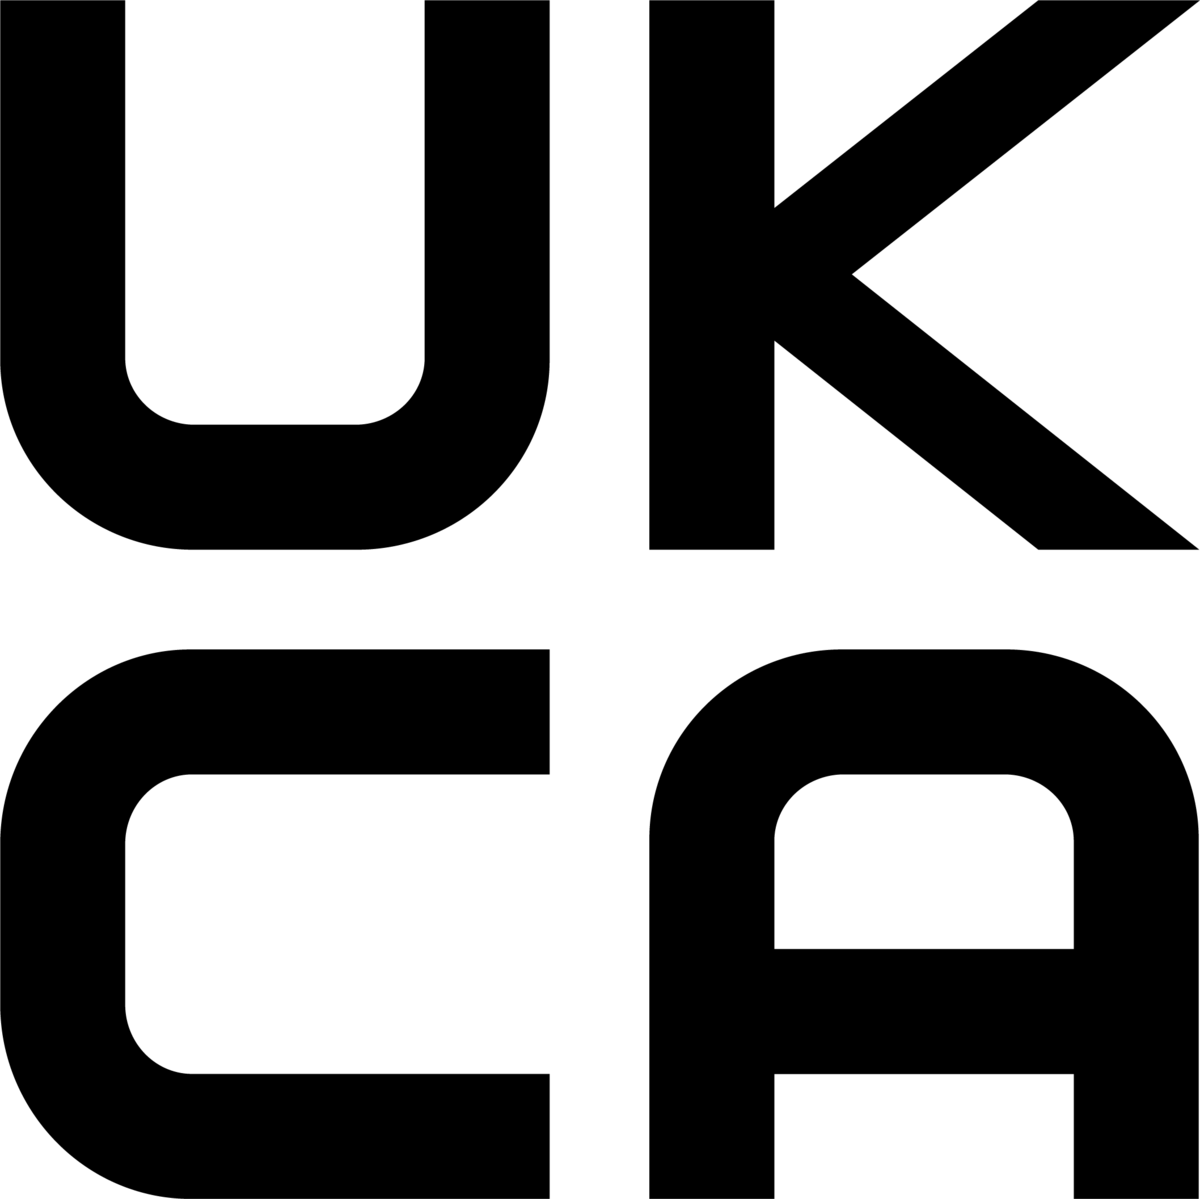 1200px-UKCA_black_fill